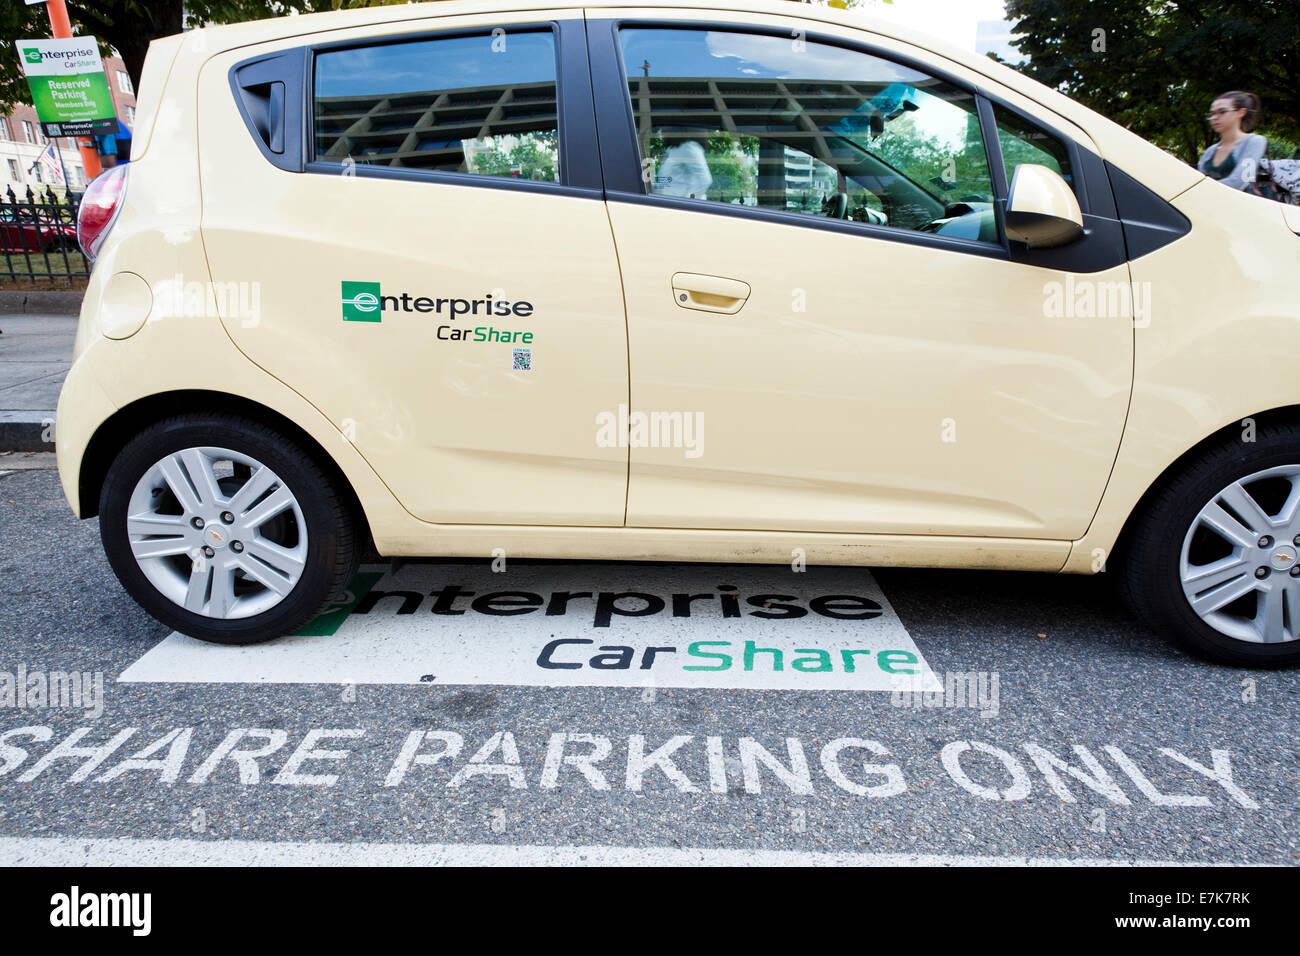 Enterprise Car Share Number >> Enterprise Carshare Washington Dc Usa Stock Photo